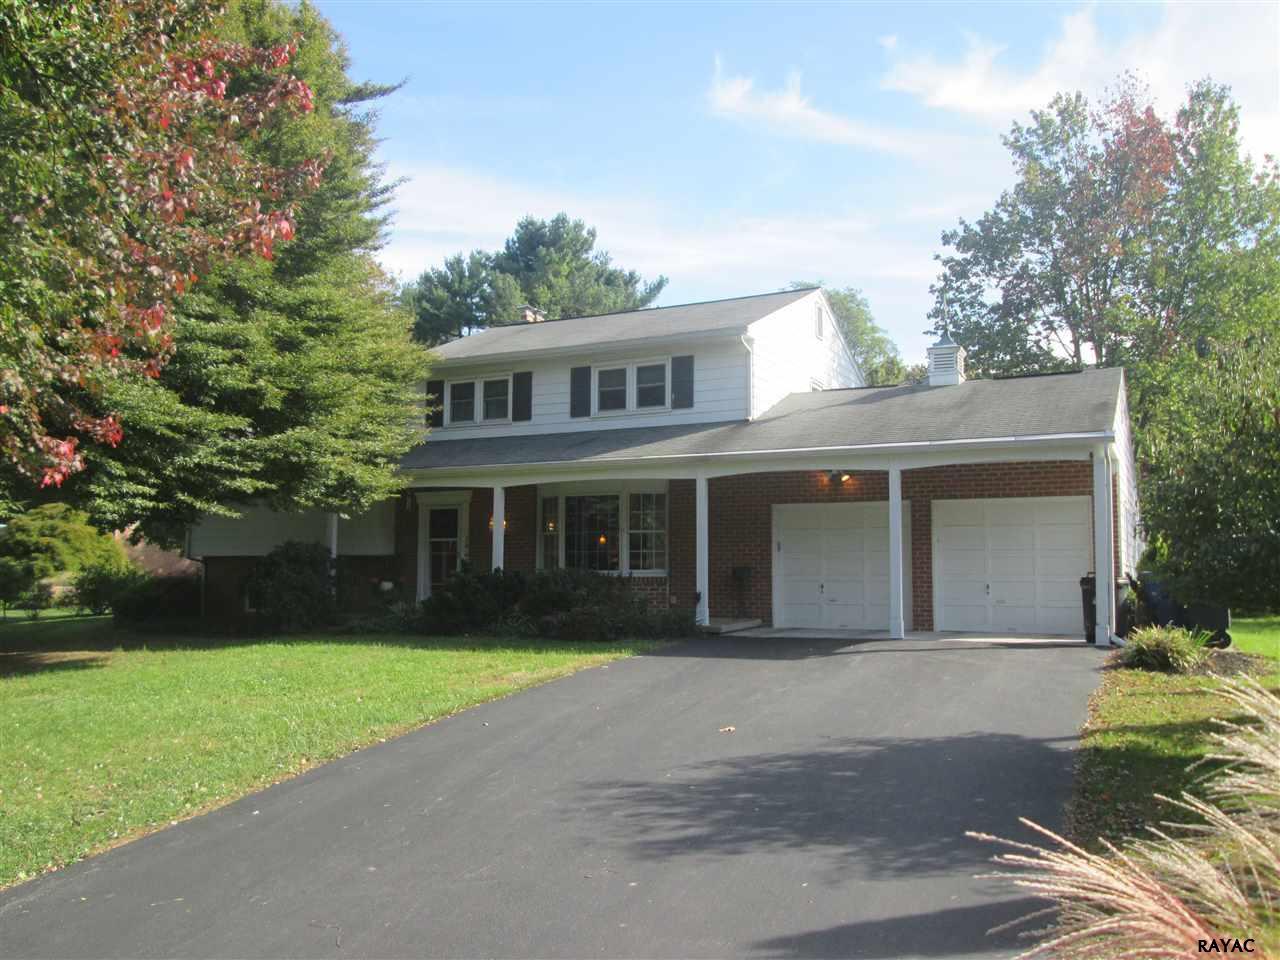 558 Fairview Ter, York, PA 17403